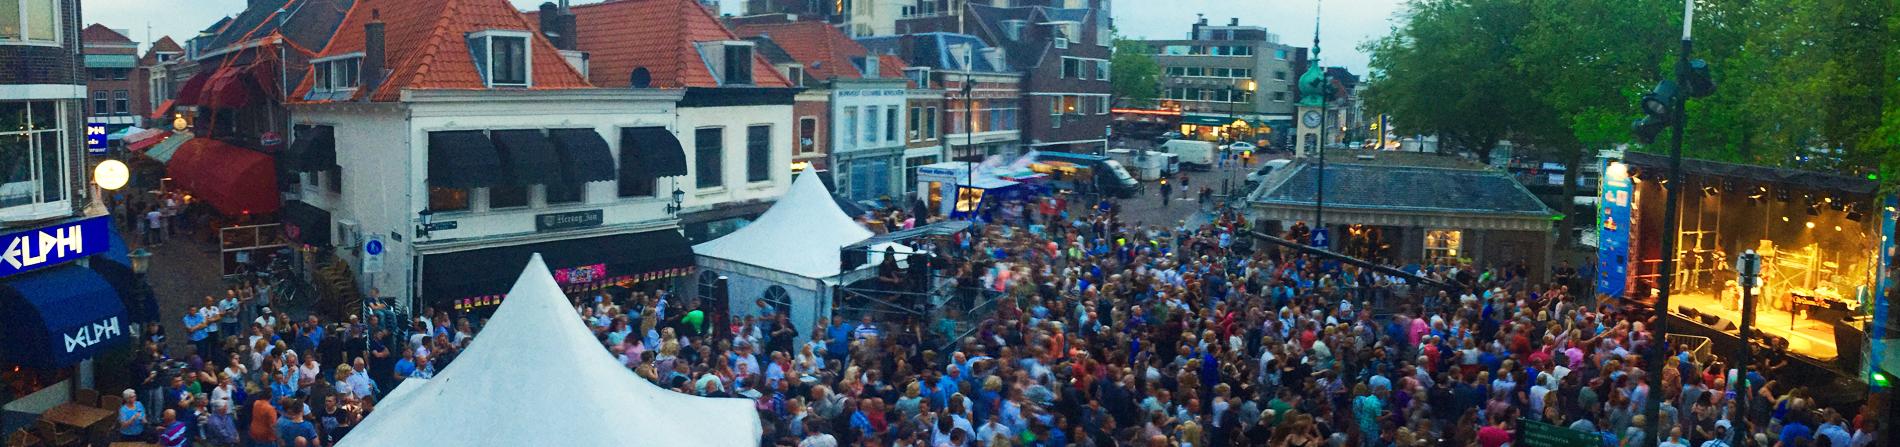 stadshart_vlaardingen_festival